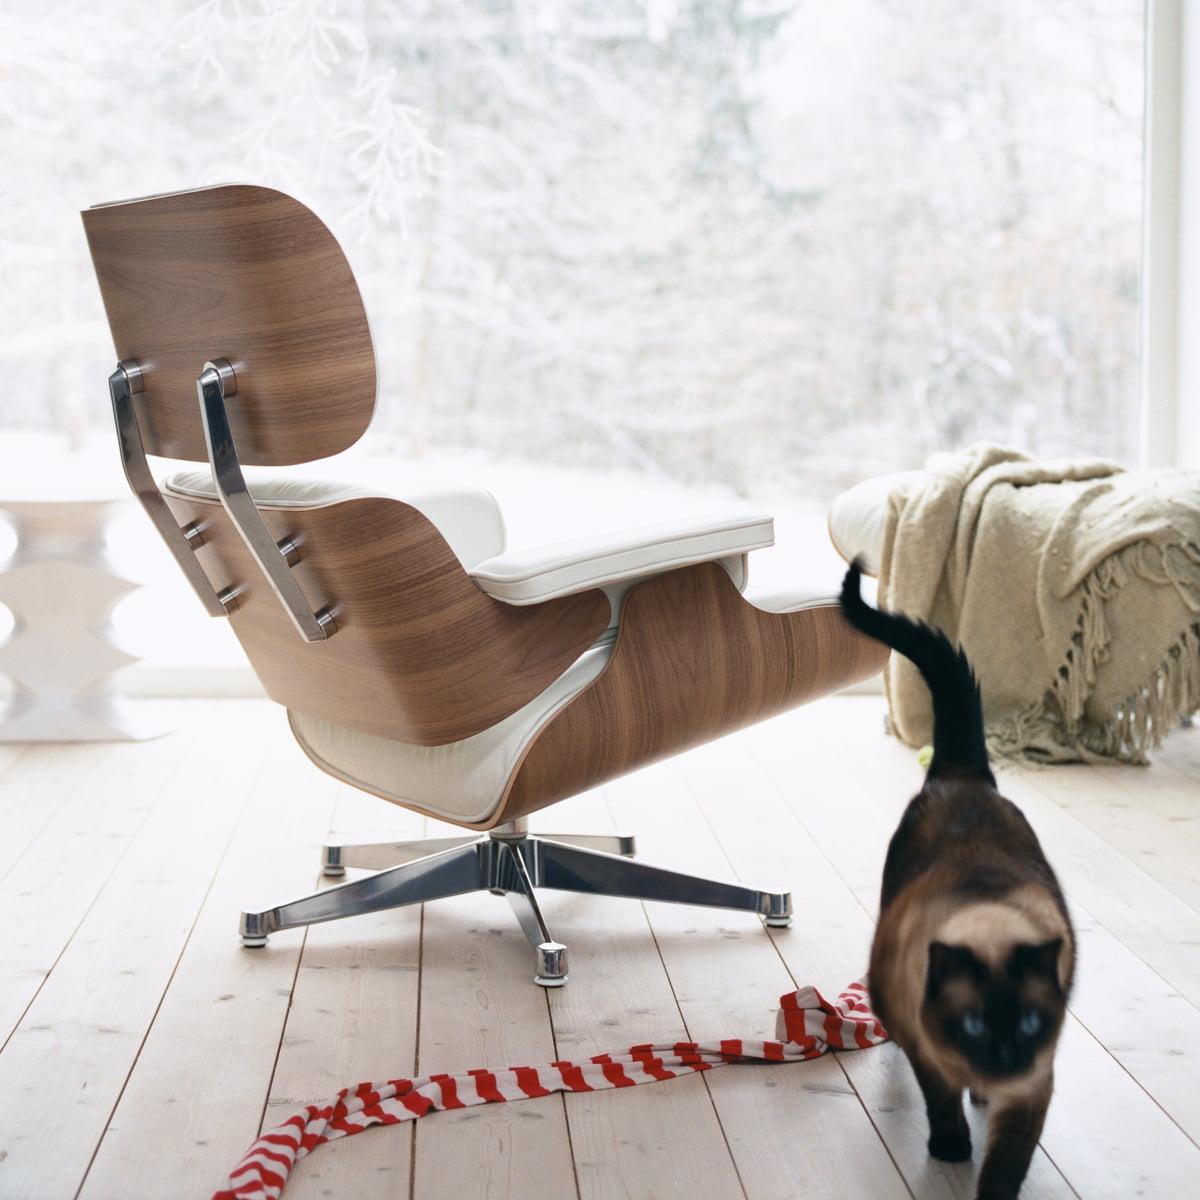 Vitra lounge chair amp ottoman white version von charles amp ray eames -  Ottoman White Version Von Charles Amp Ray Eames Vitra Lounge Chair Download